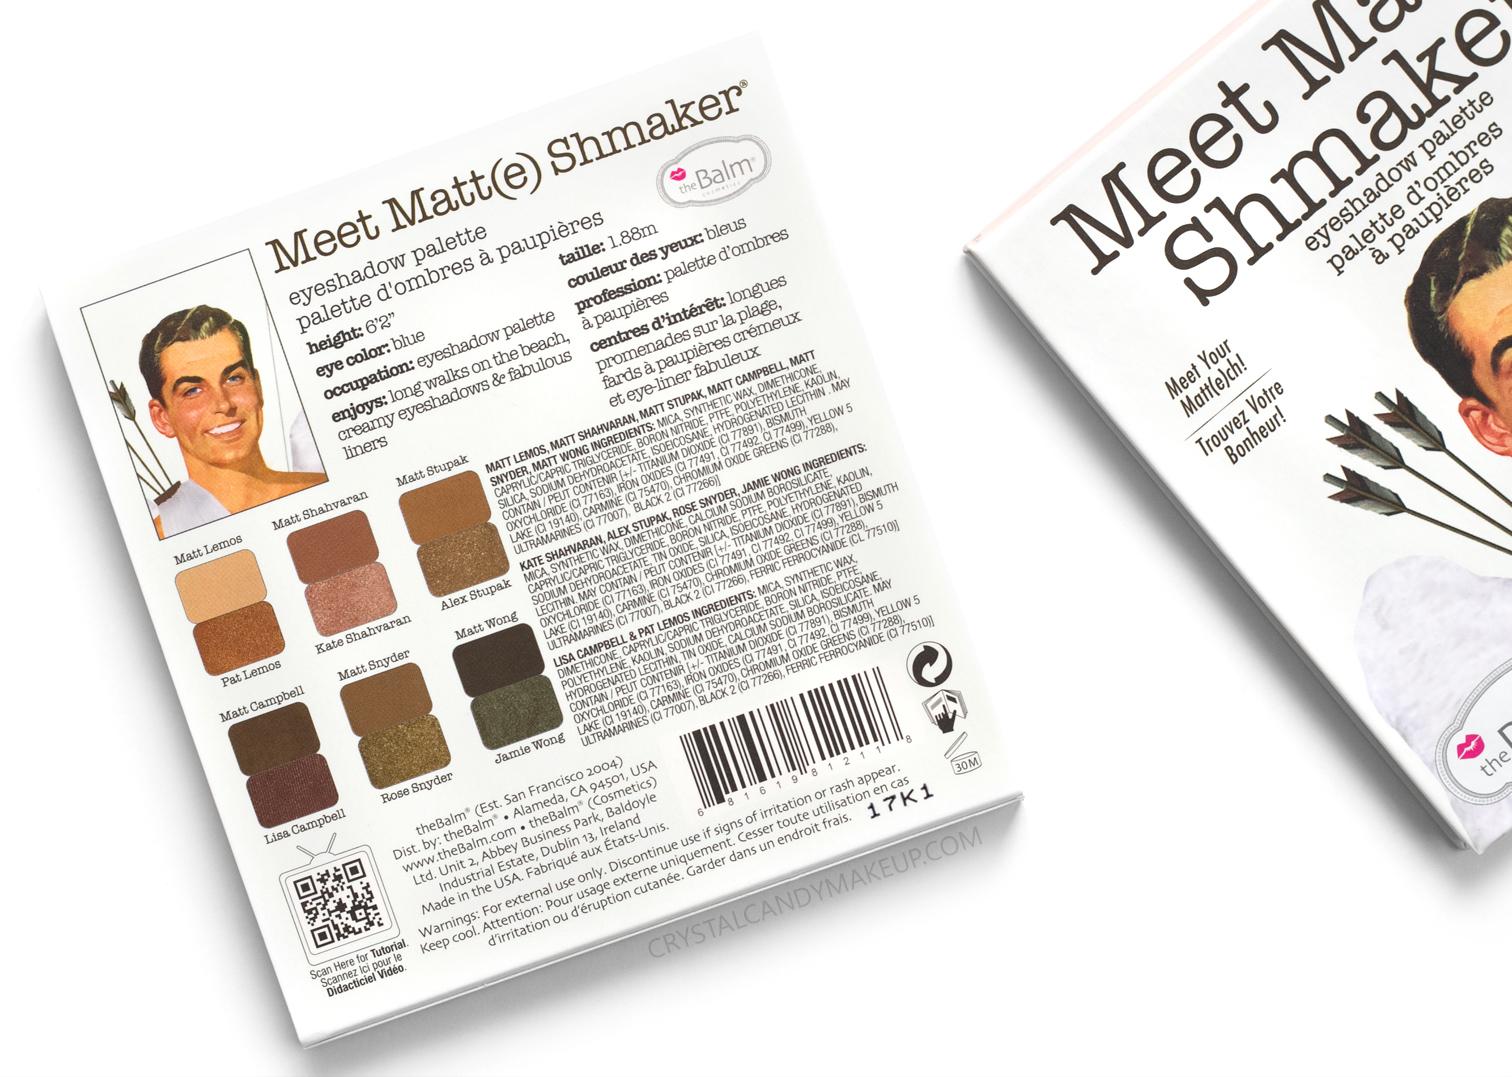 Thebalm-Meet-Matte-Shmaker-Eyeshadow-Palette-Ingredients